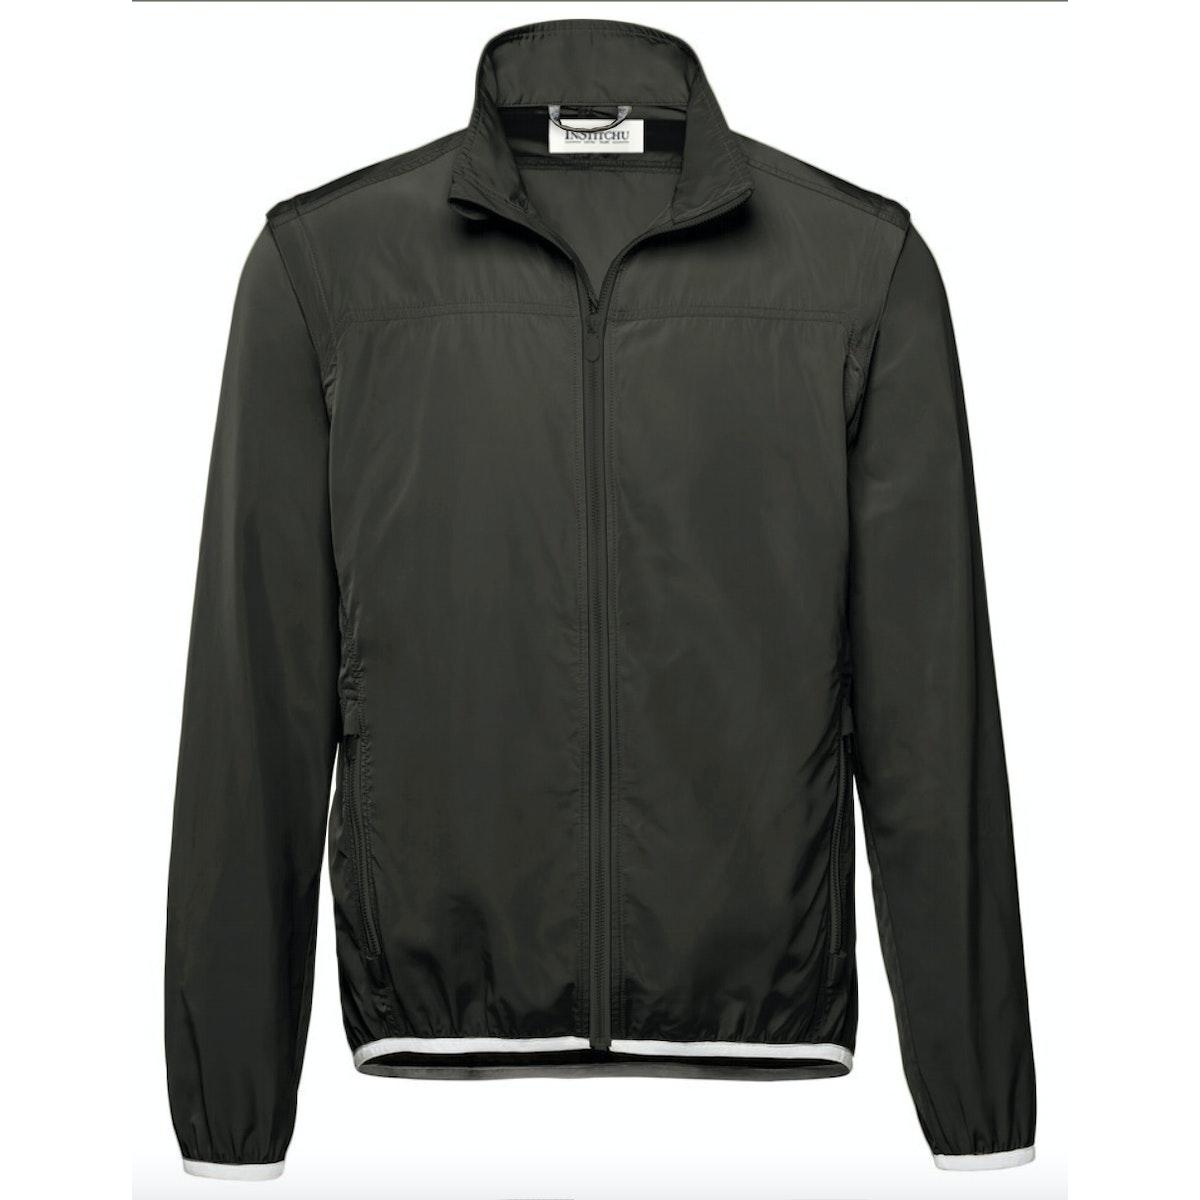 The Woods Grey Golf Jacket